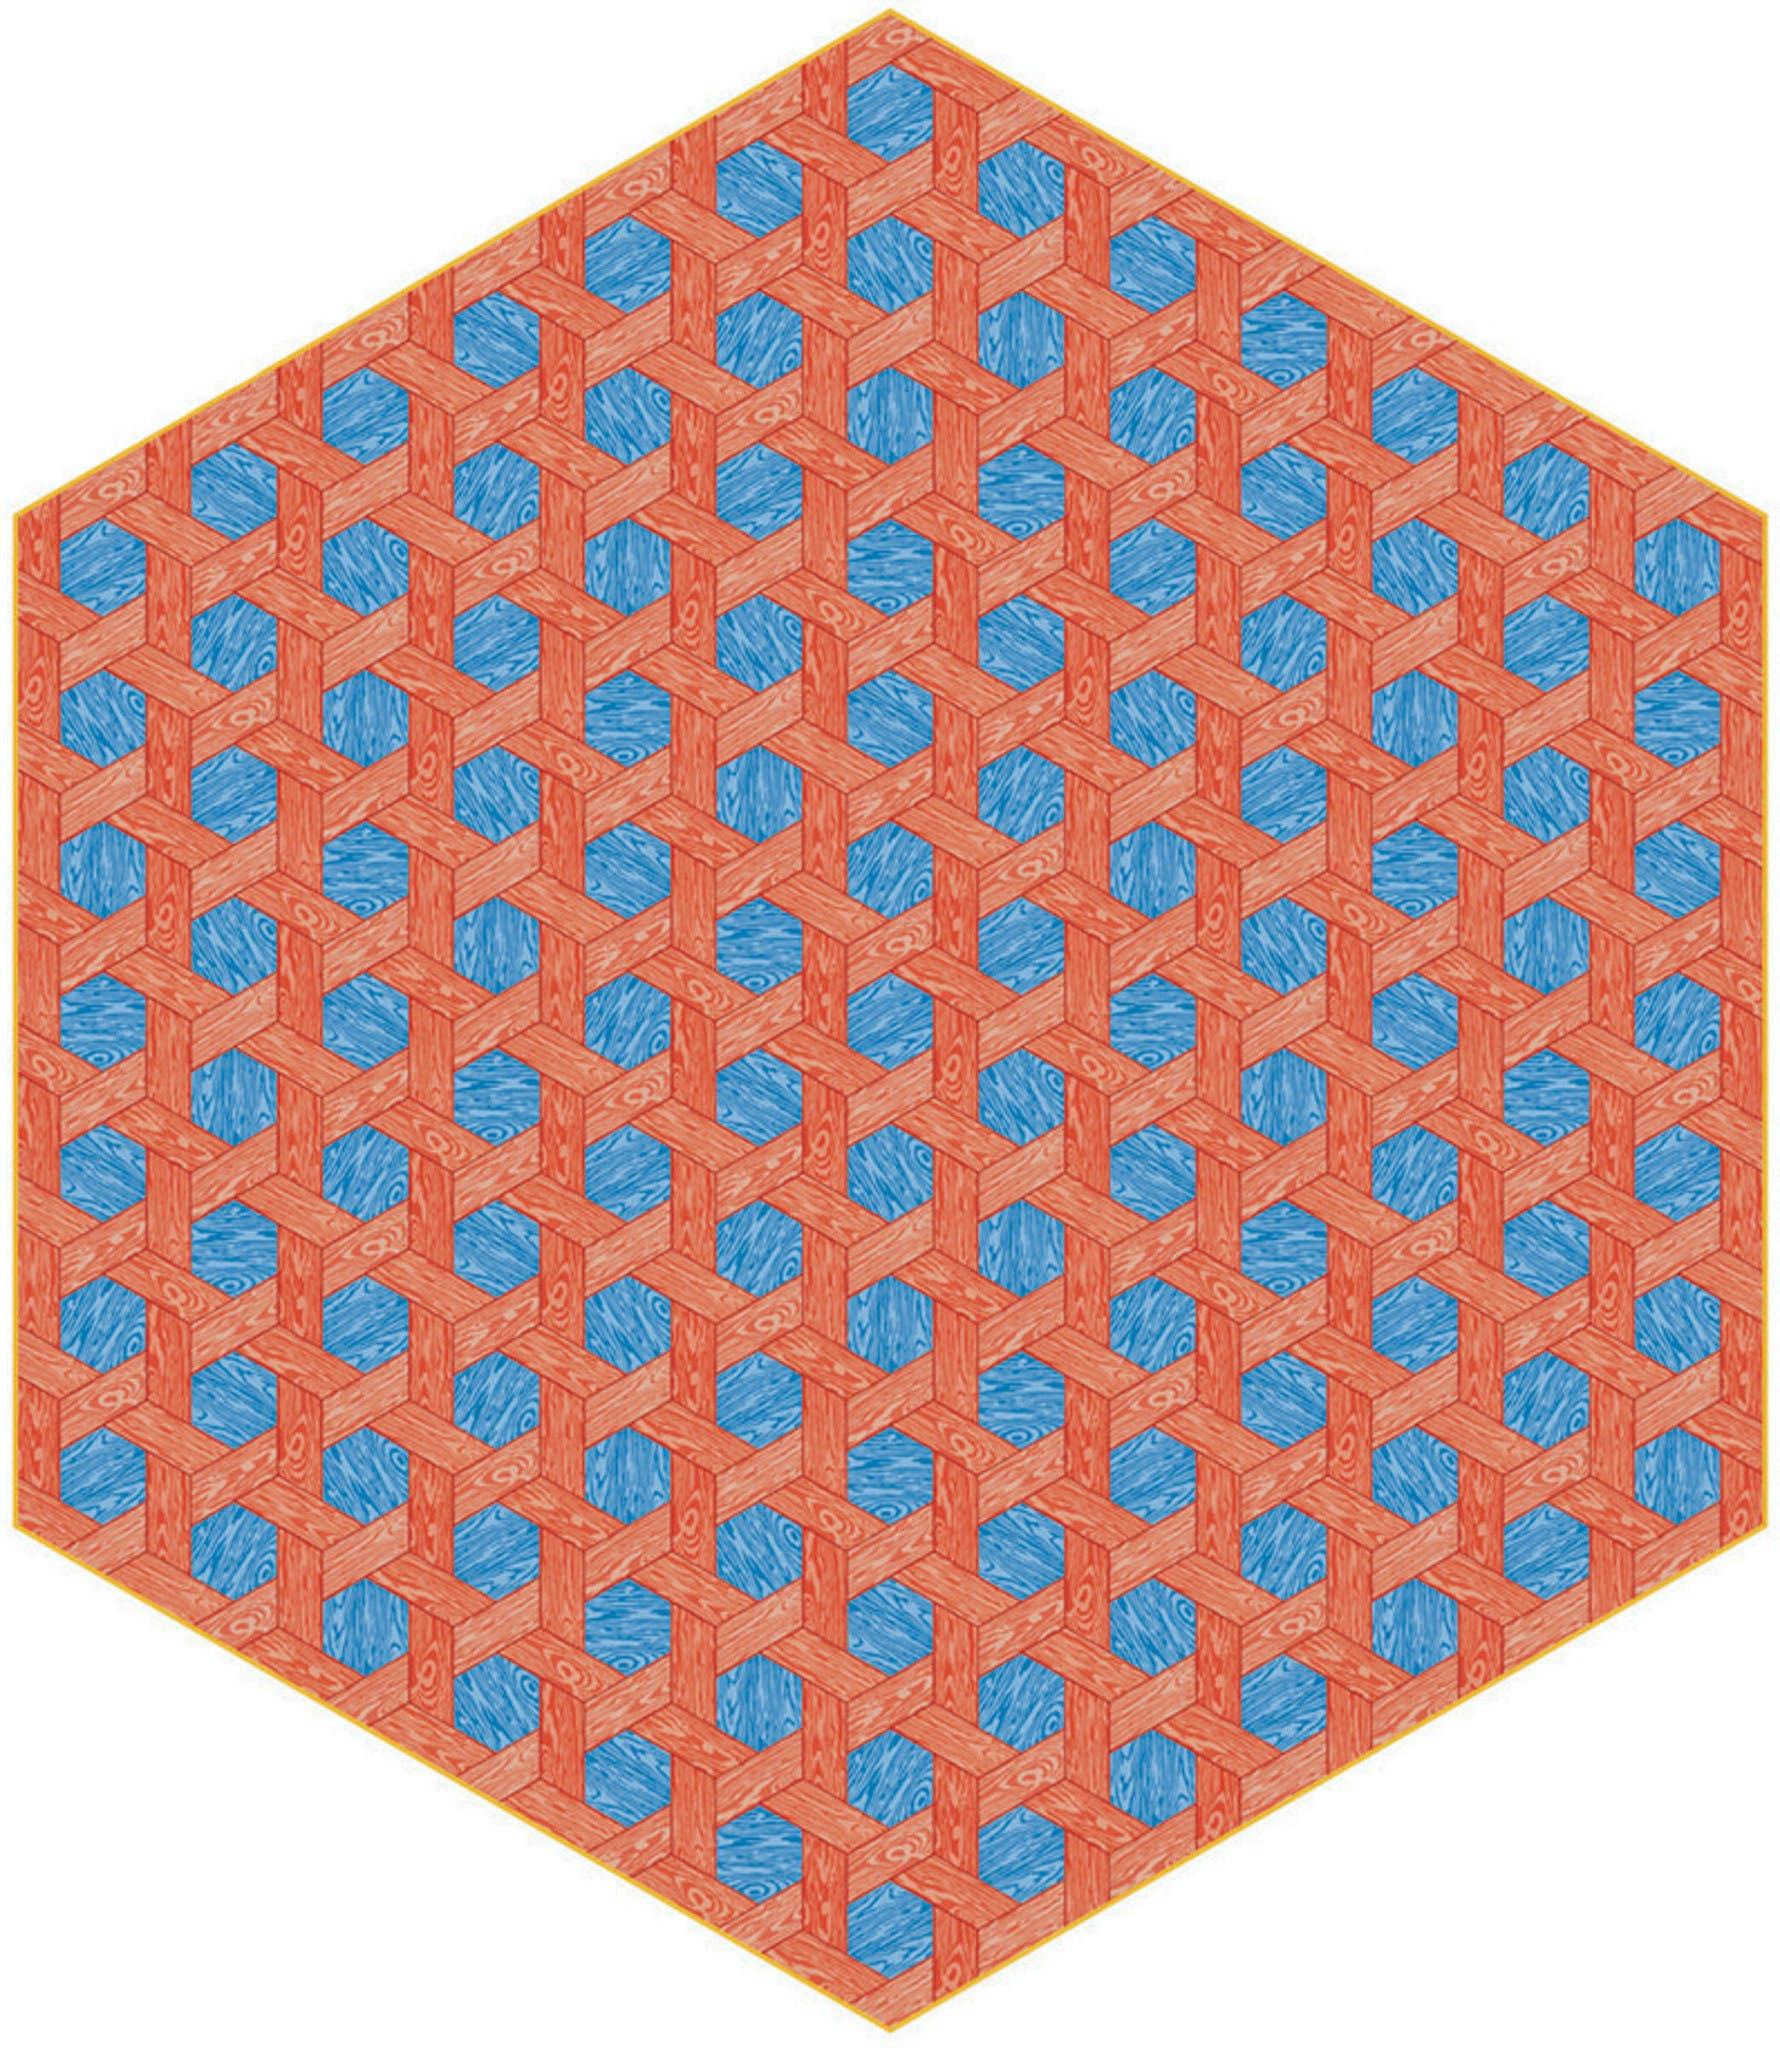 Moooi Carpets Hexagon Red Blue Haute Living